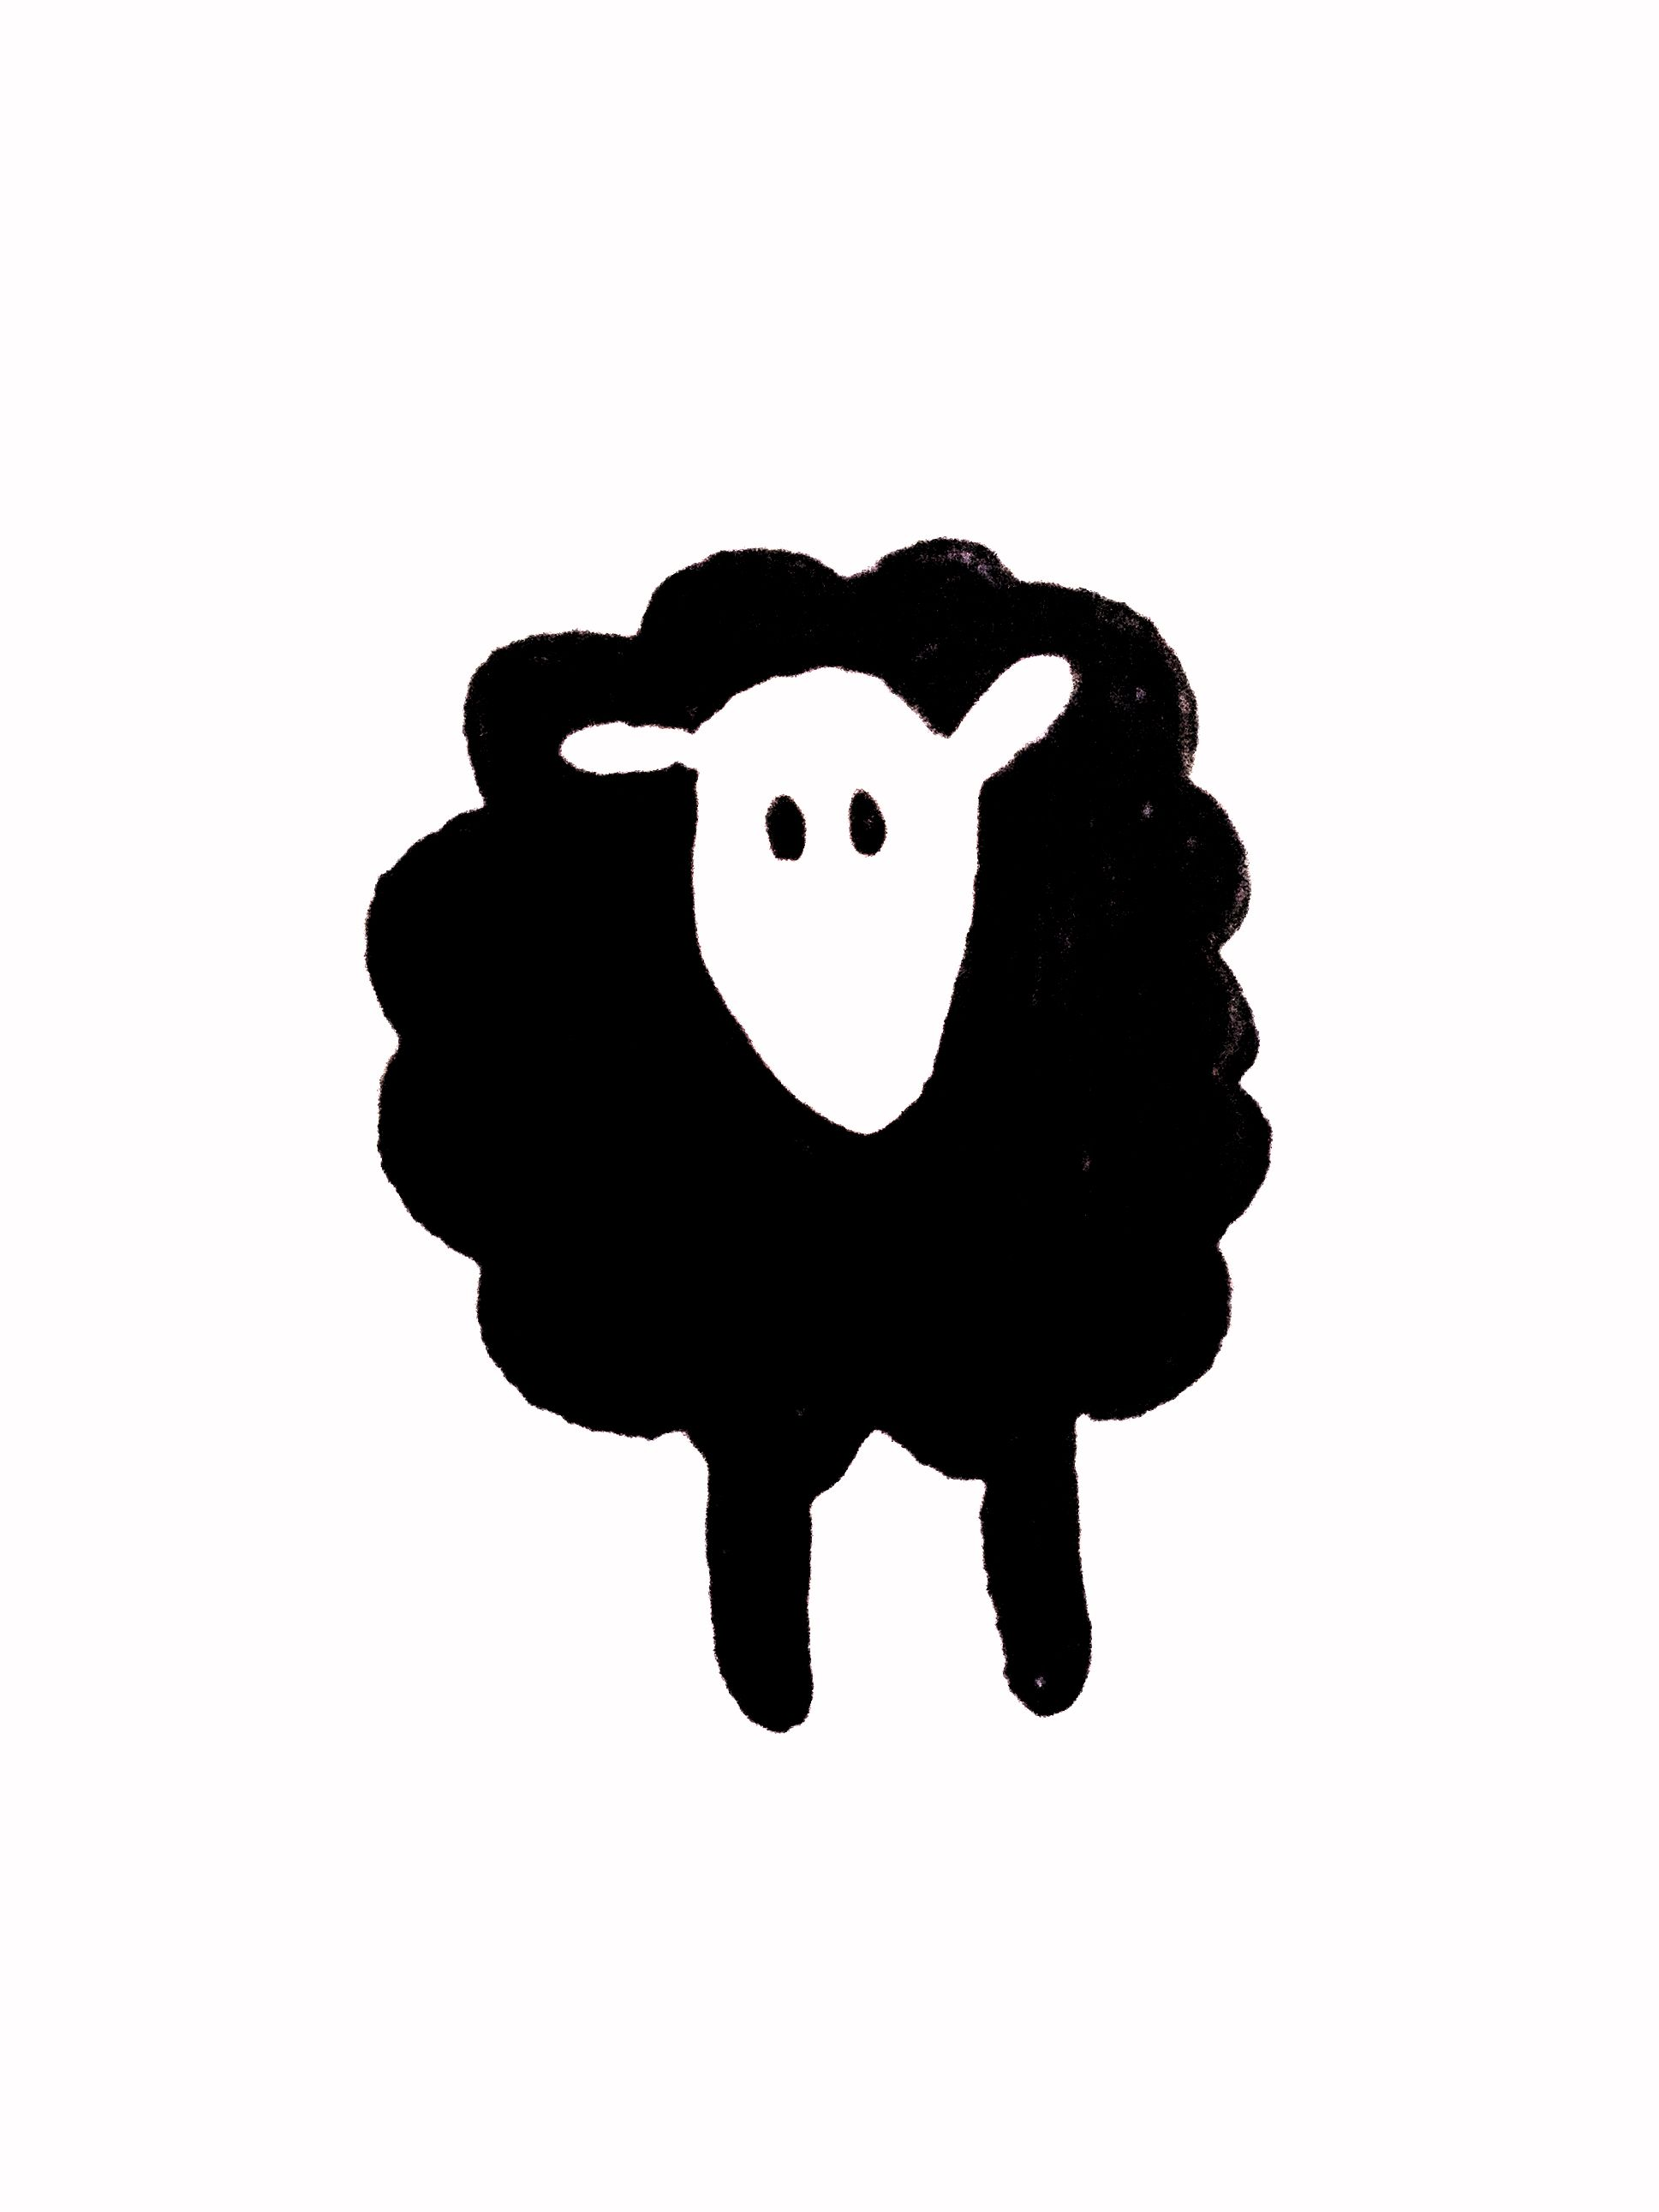 Black Sheep Sheep Tattoo Black Sheep Tattoo Sheep Illustration